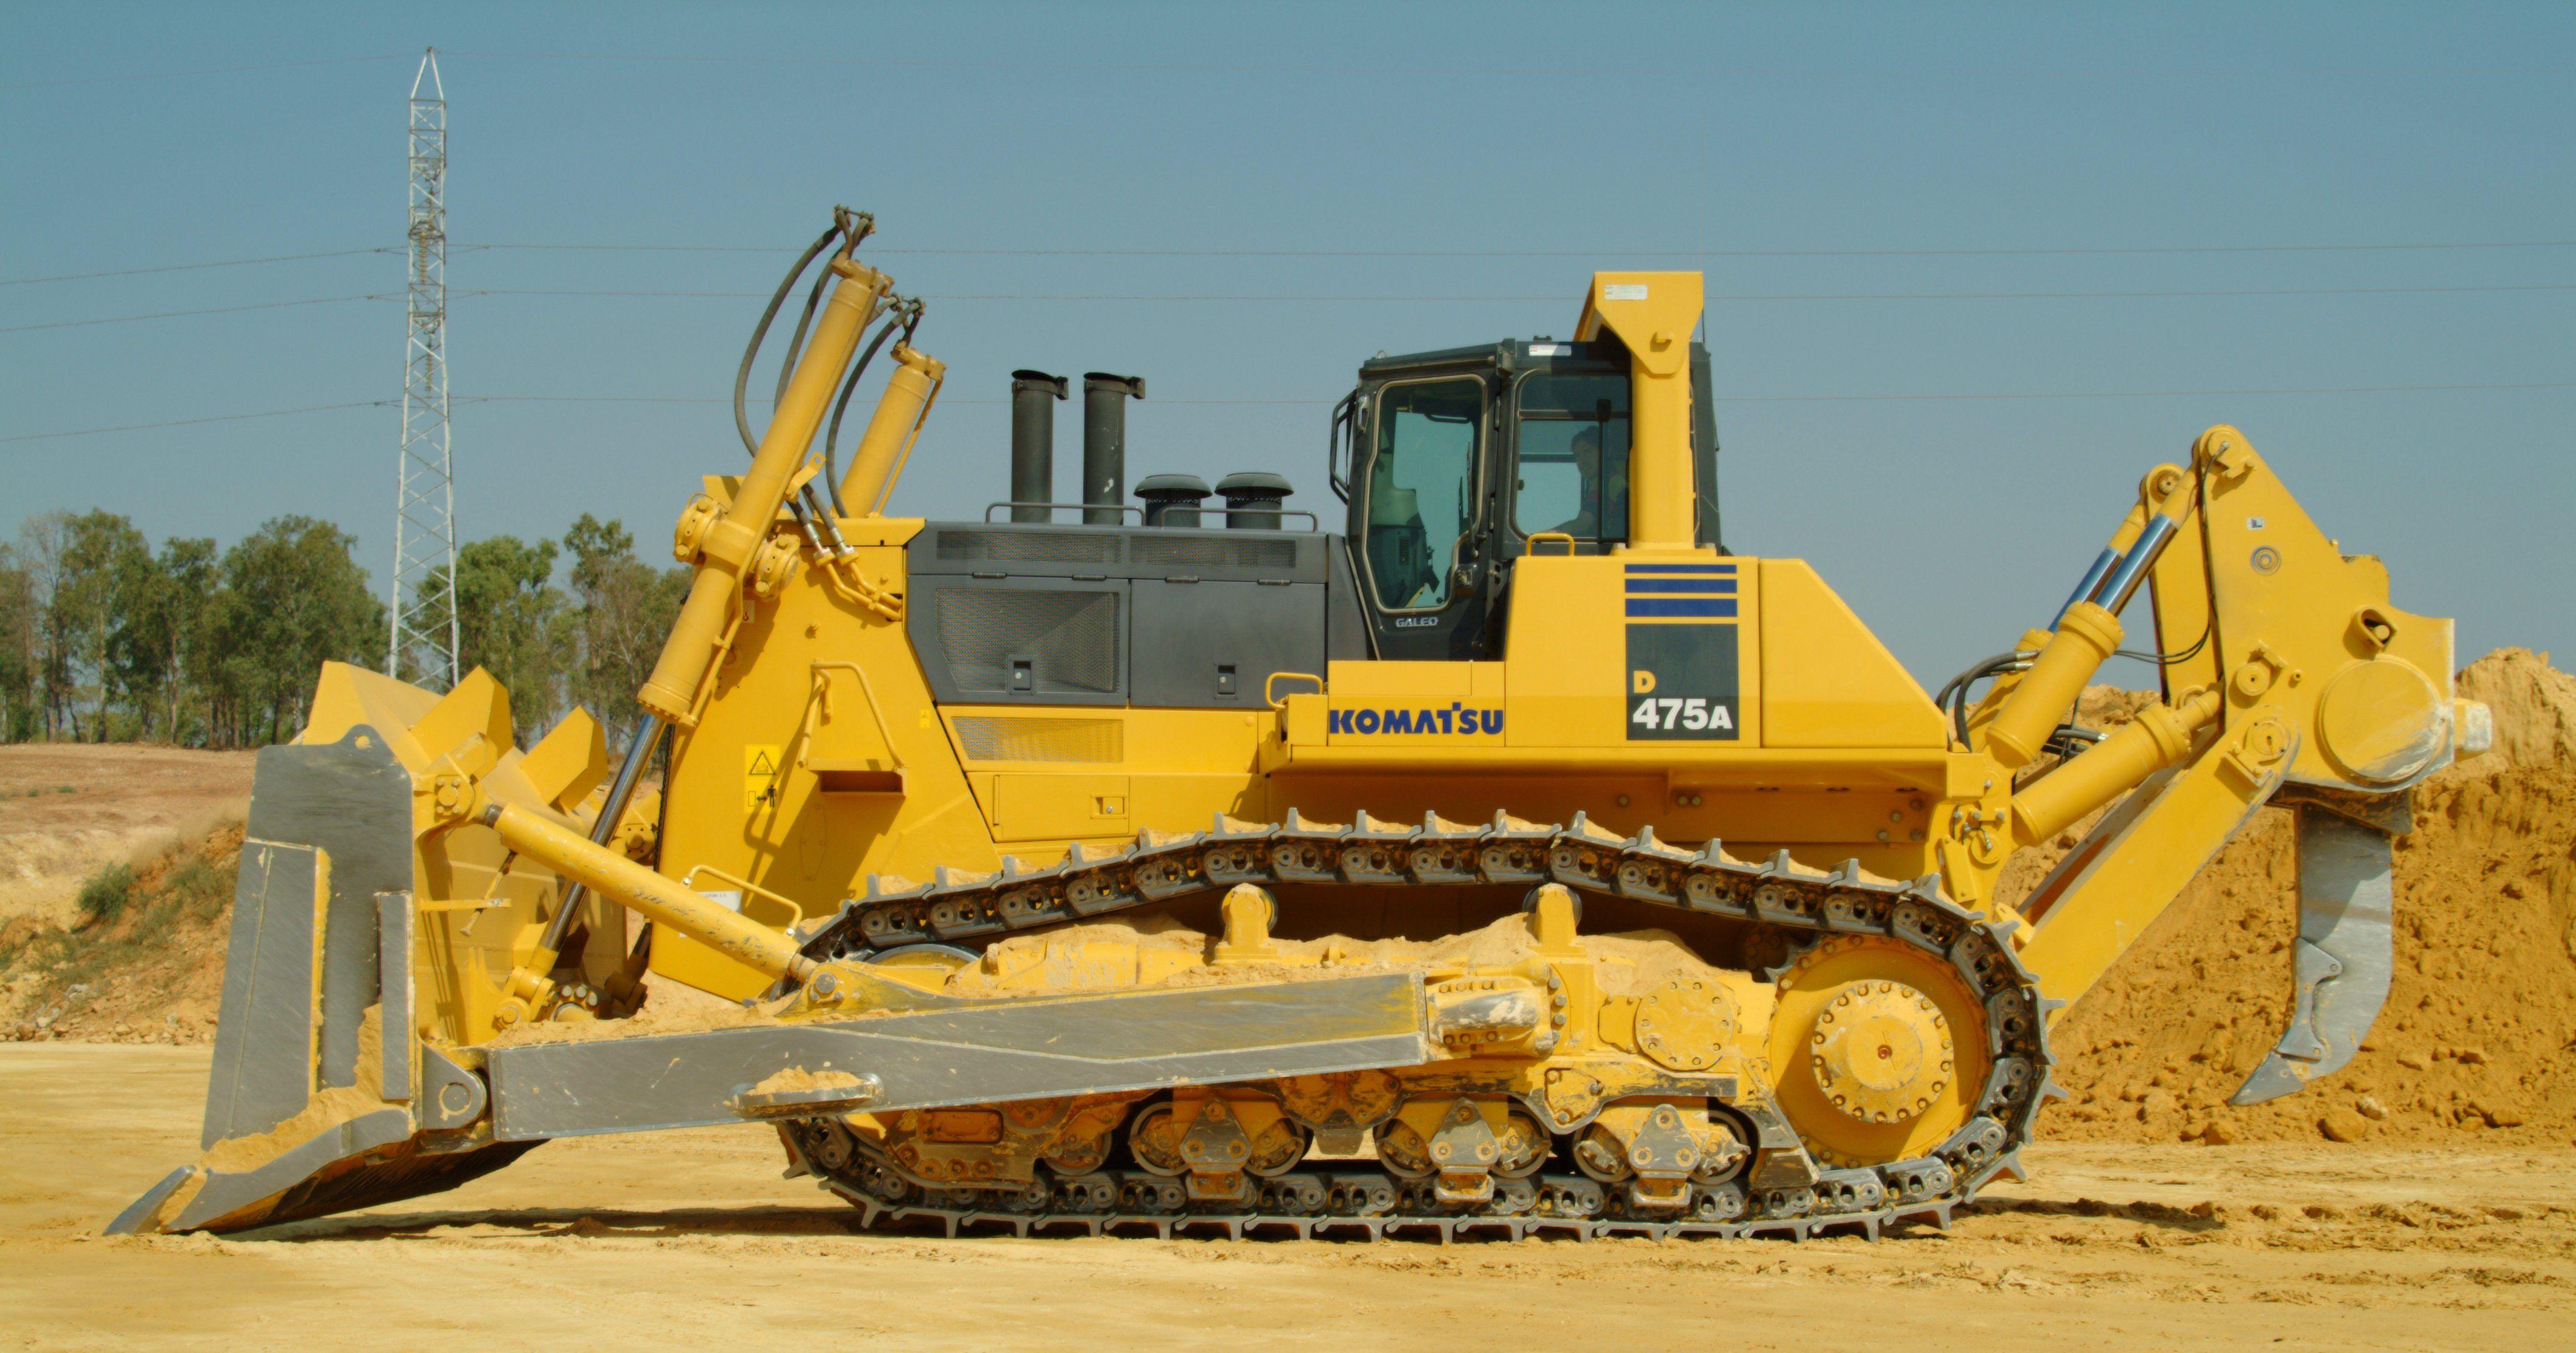 komatsu bulldozer hd wallpapers heavy equipment pinterest